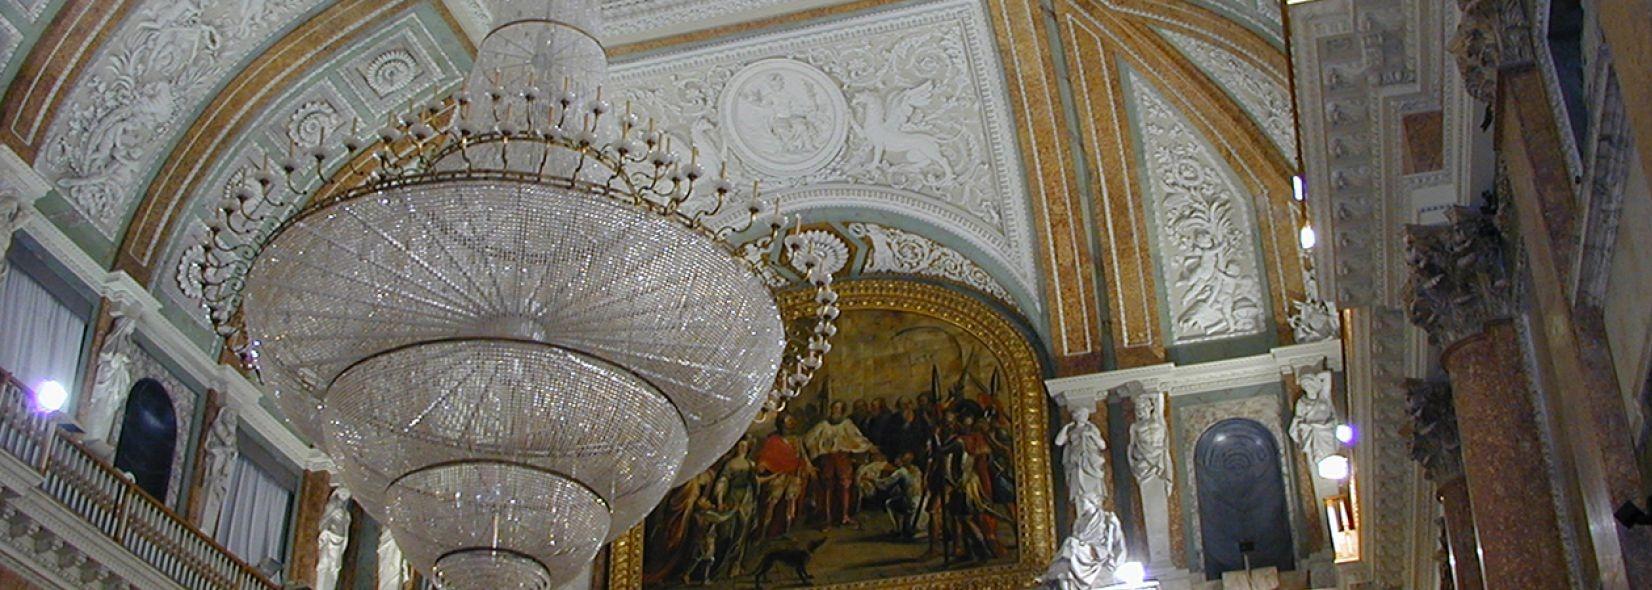 chandalier in palazzo ducale